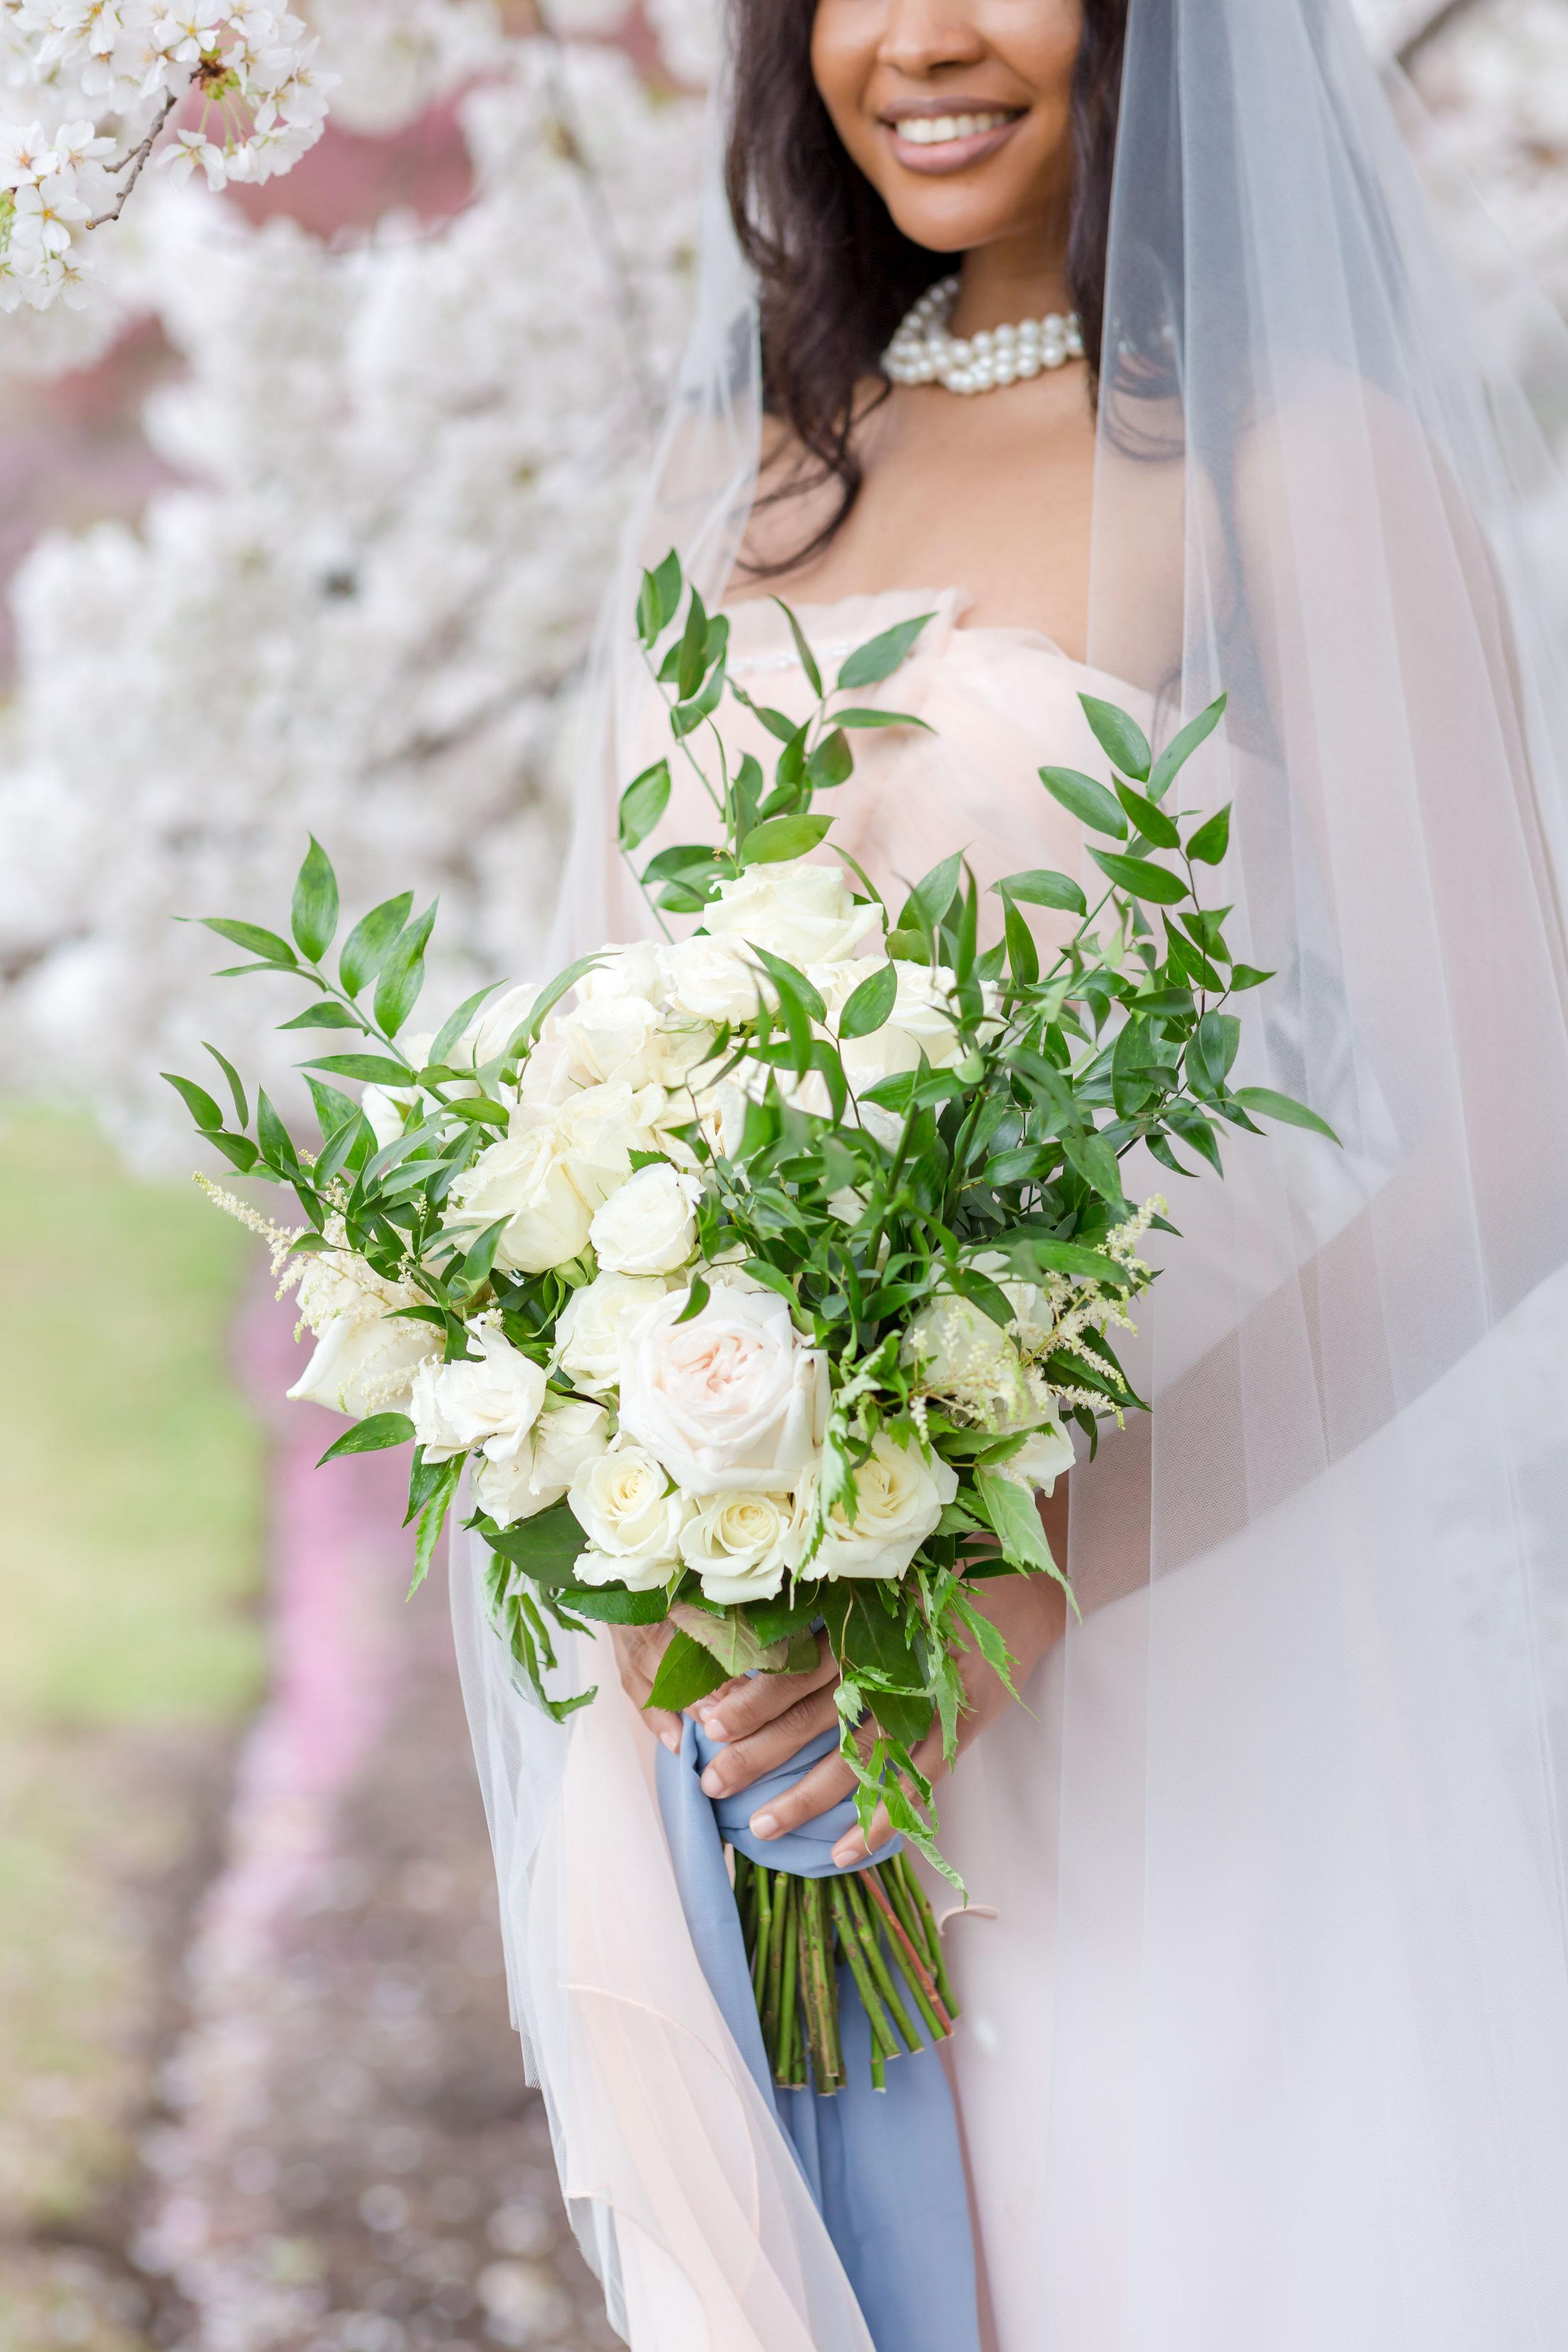 ScarlettExpressions-StyledShoot-Bridal-67.jpg